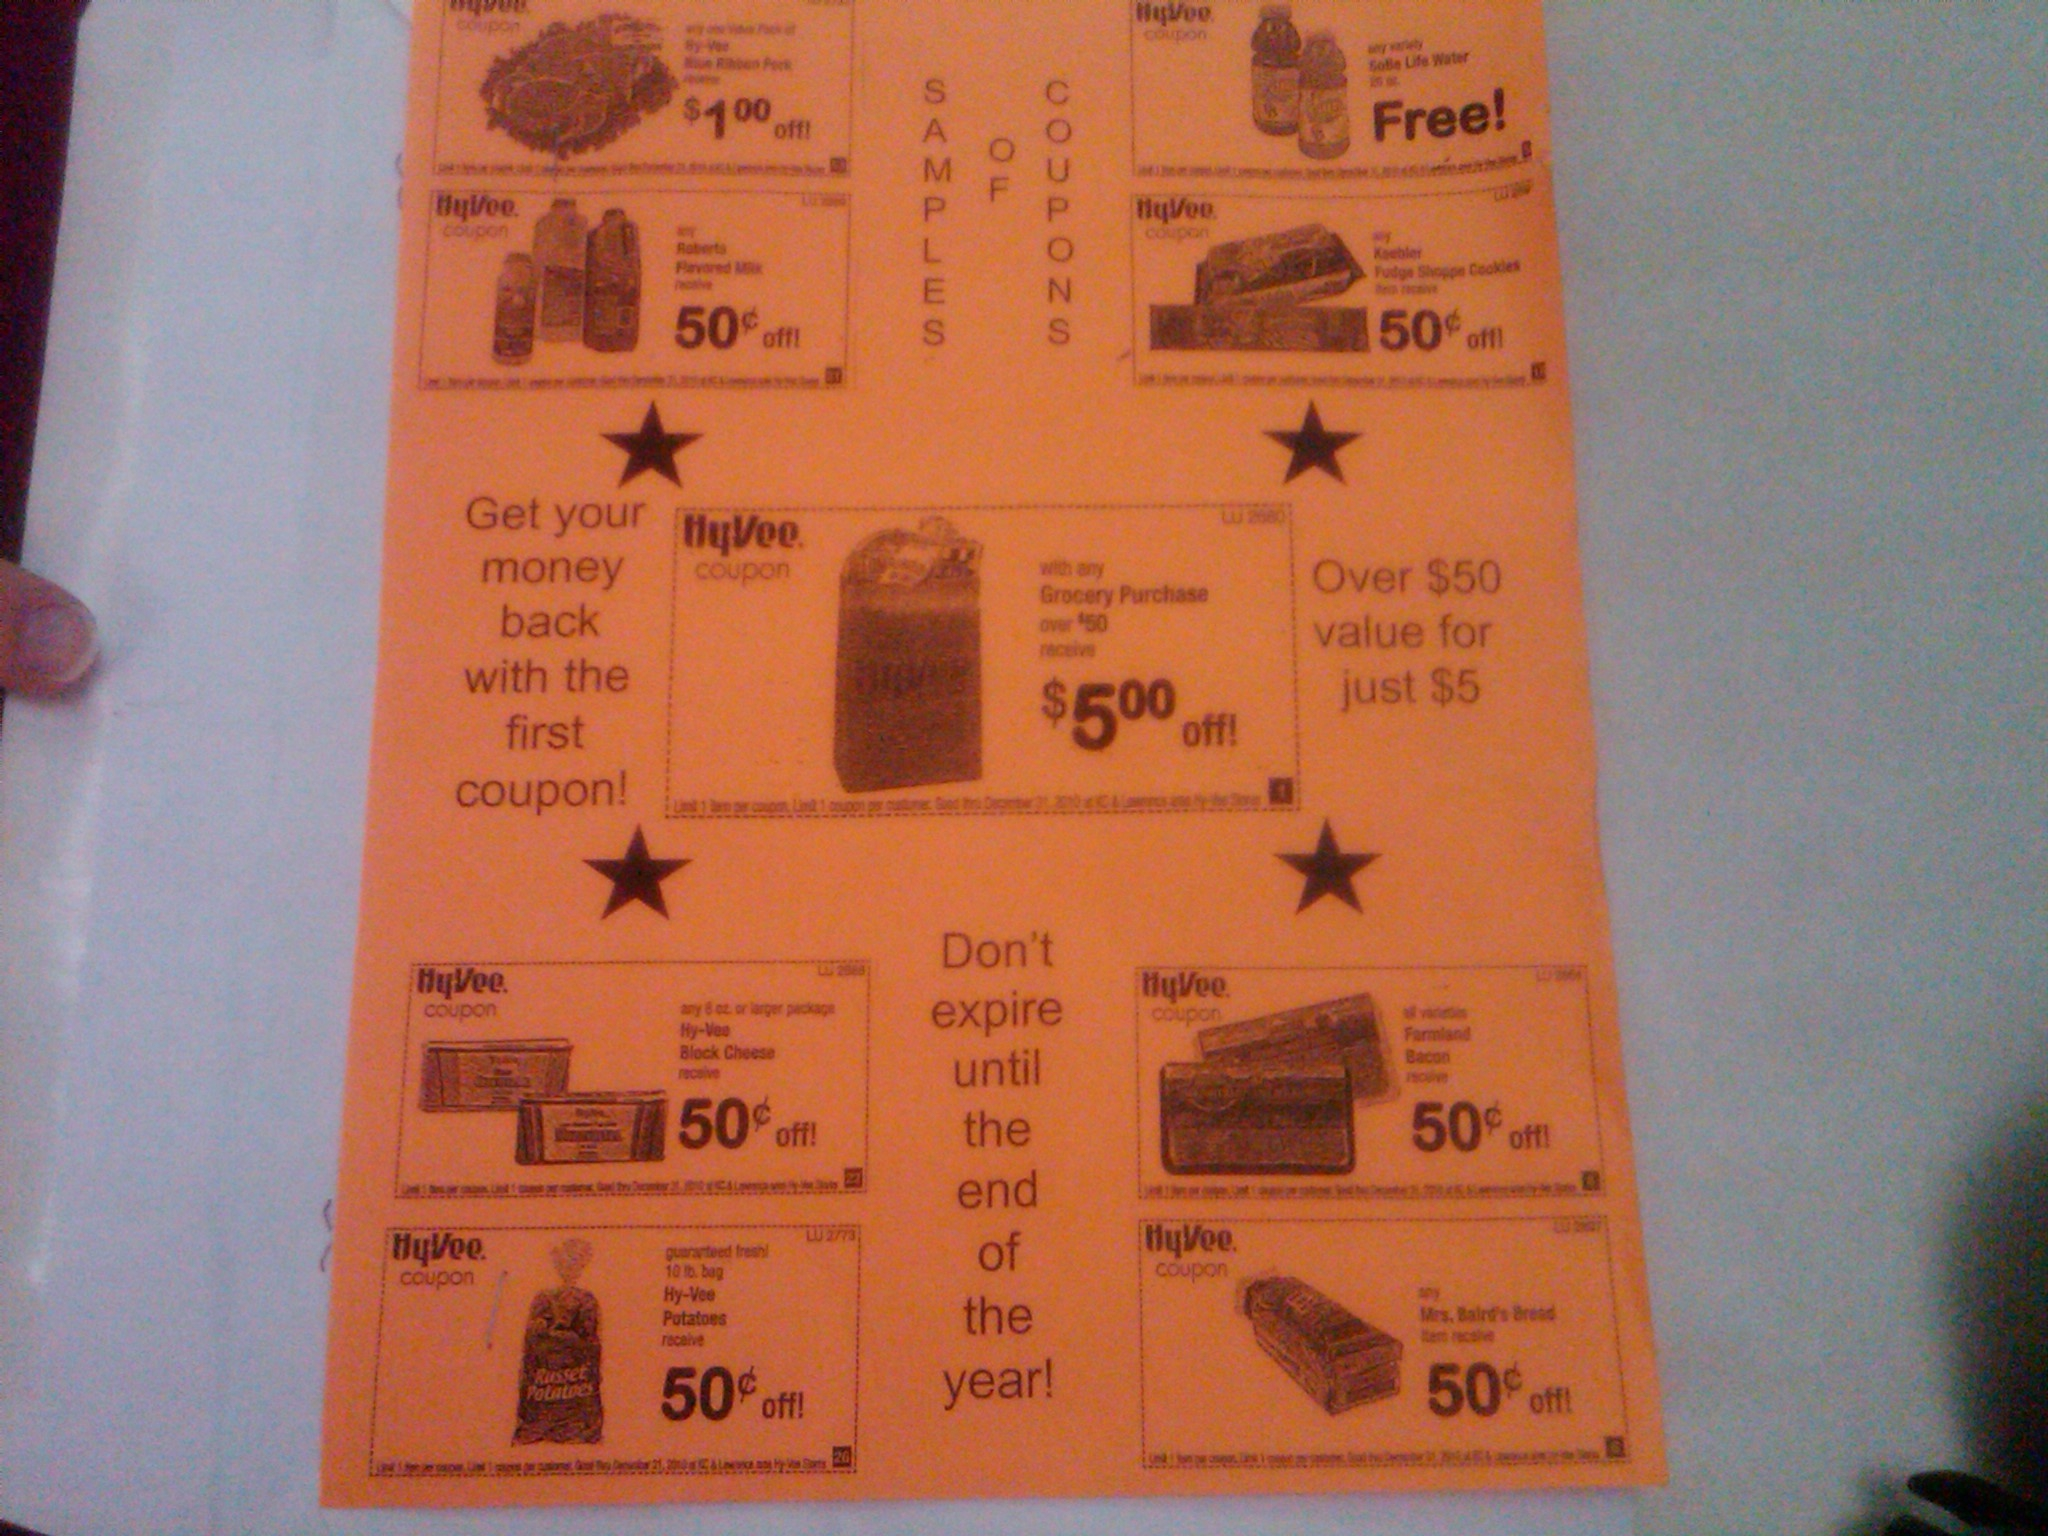 Hyvee online coupons